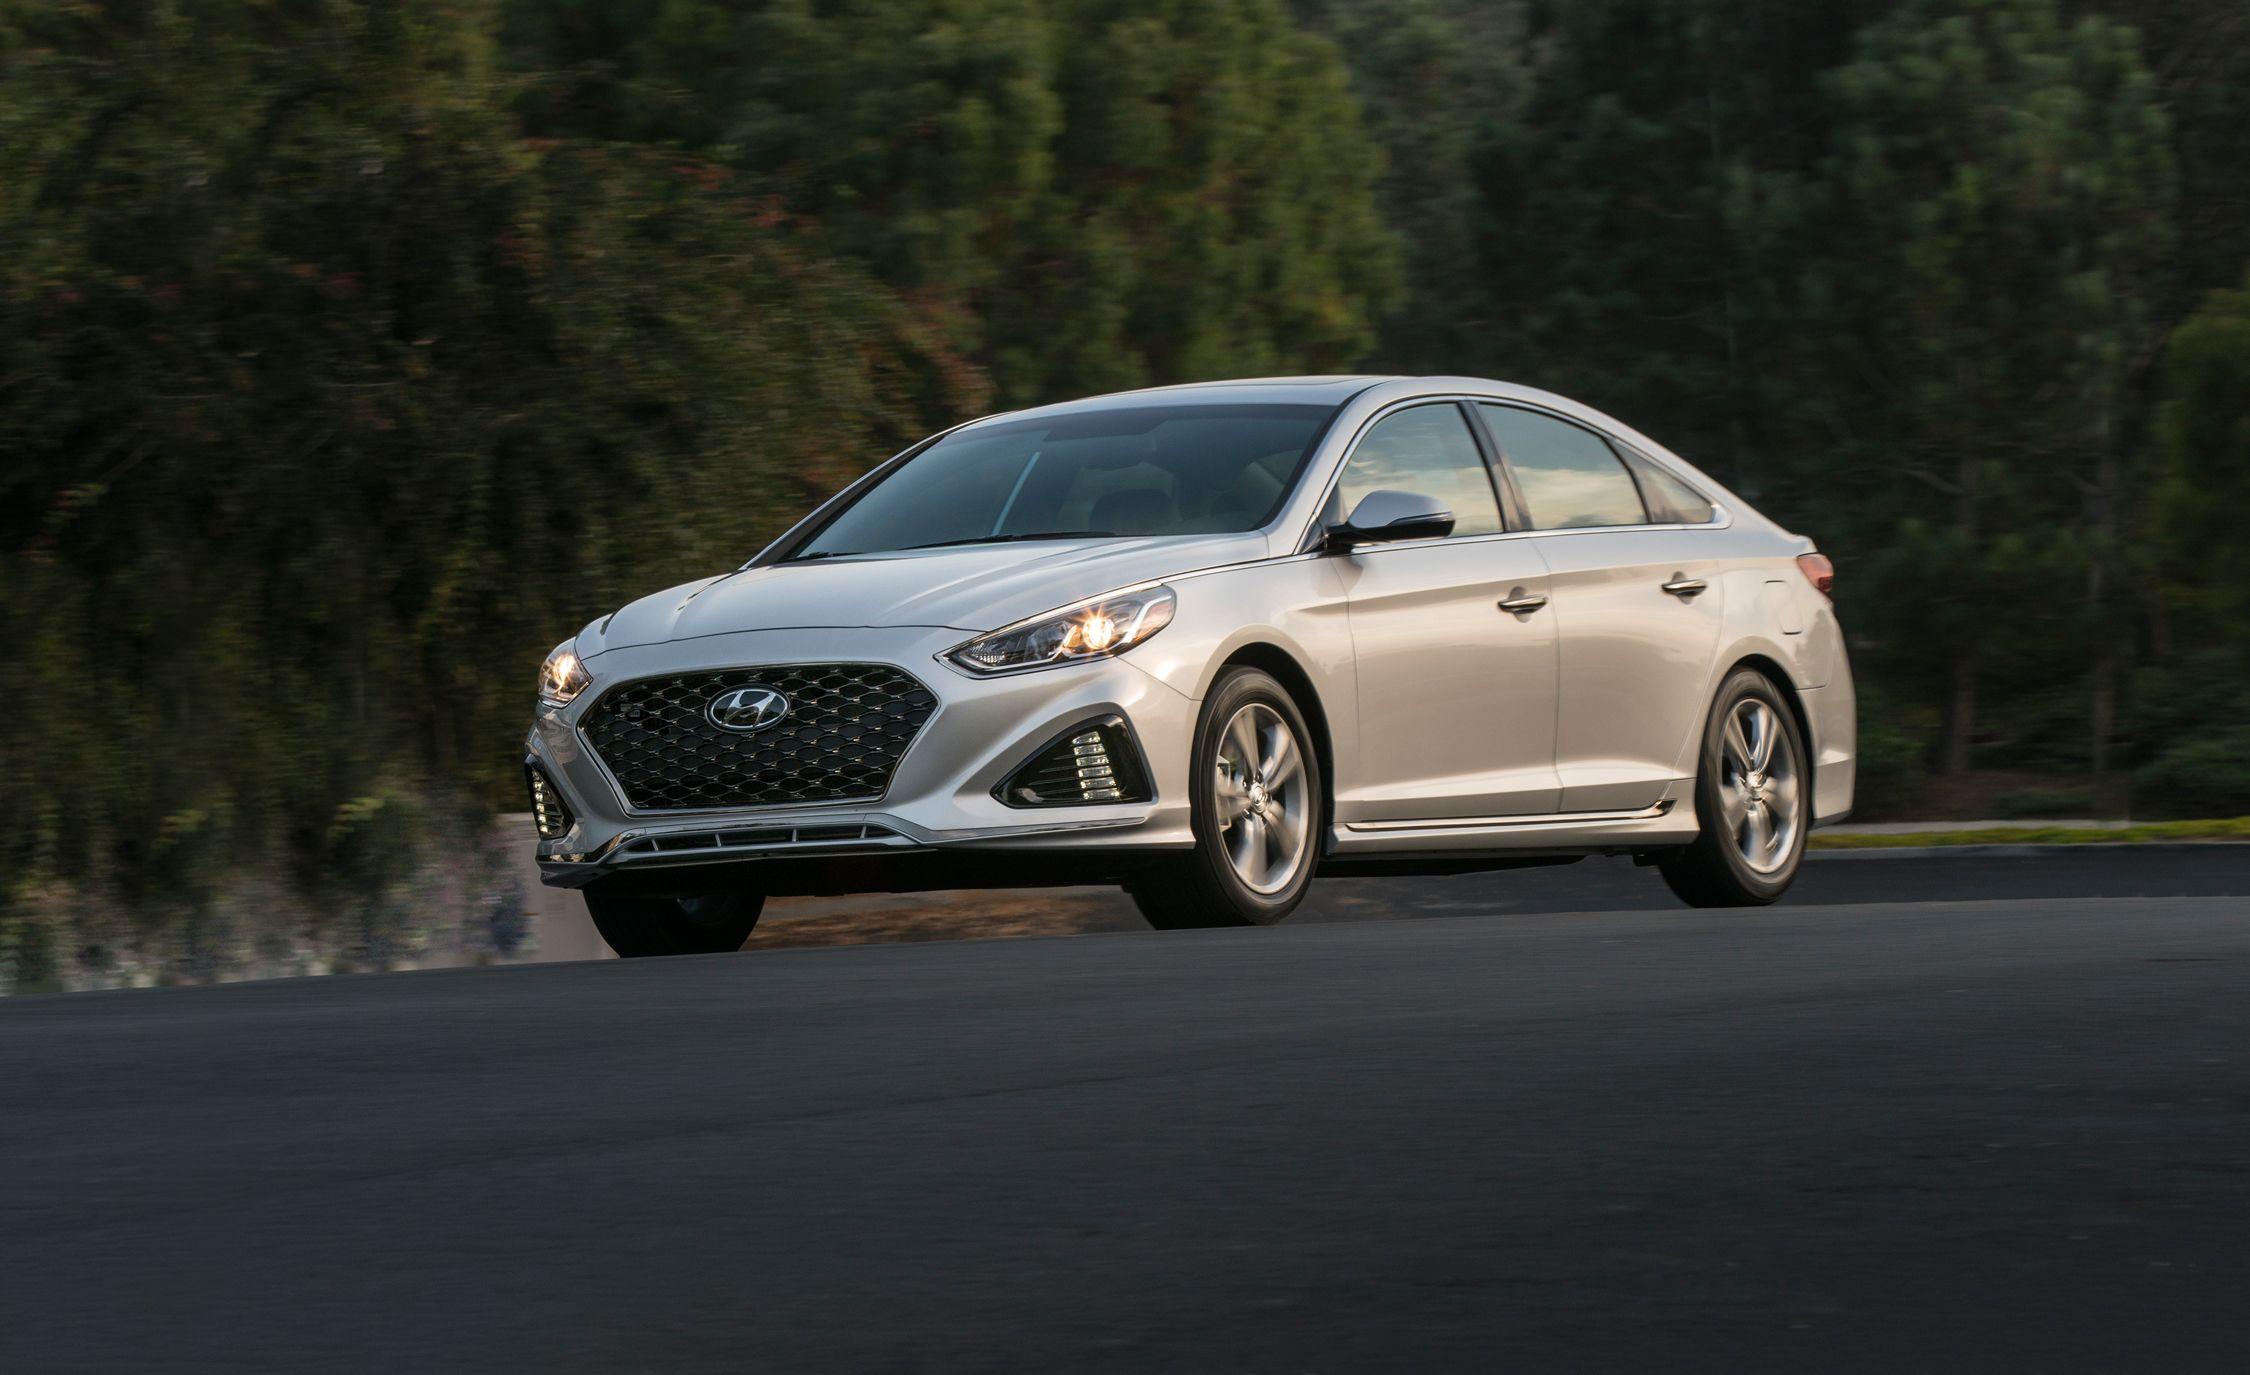 2018 Hyundai Sonata First Drive Review Car And Driver